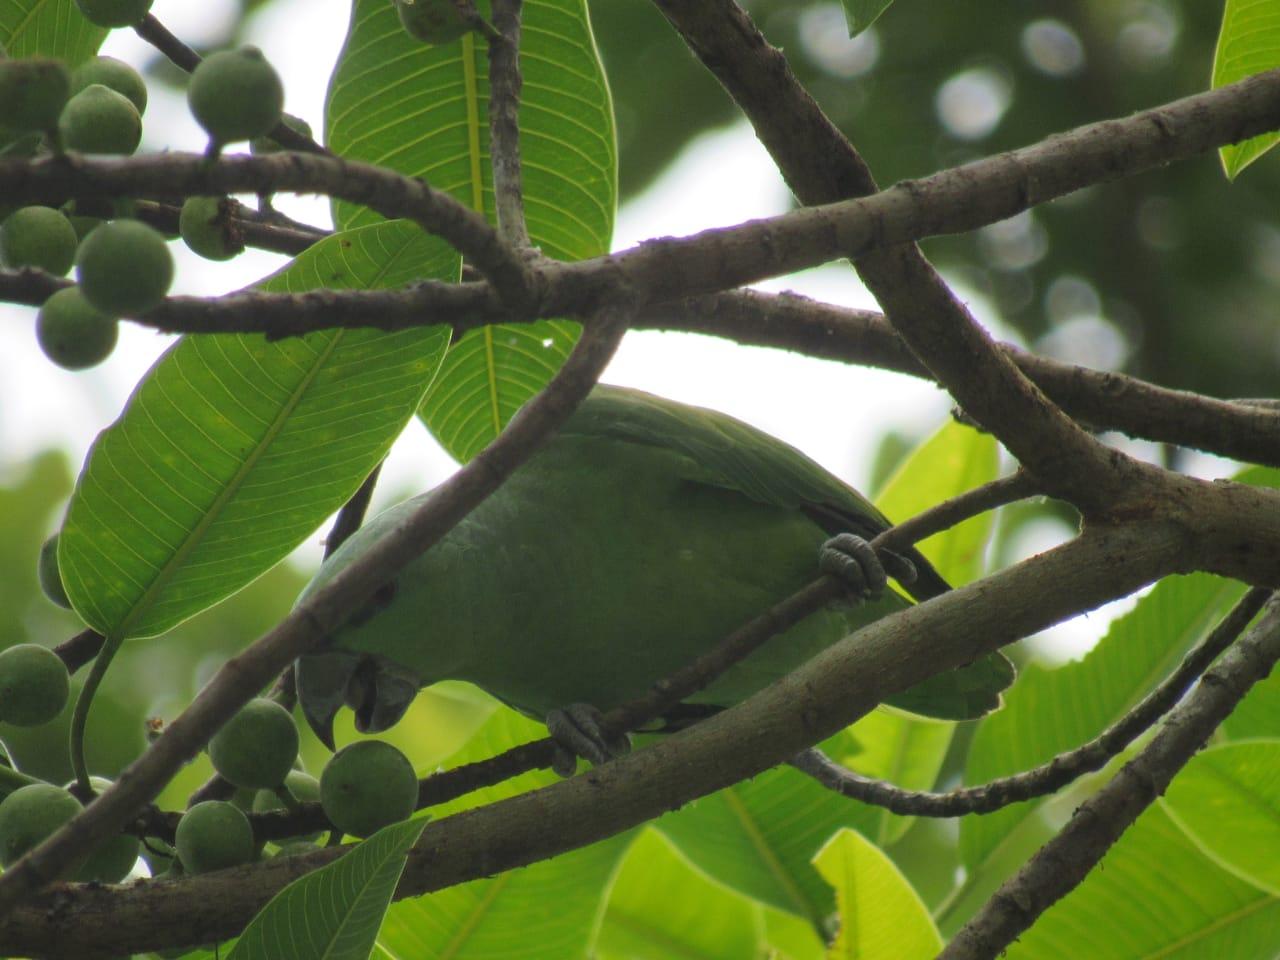 Birds watching in their naturan environment. Photo by Hipilandia Amazonas Jungle Tours.